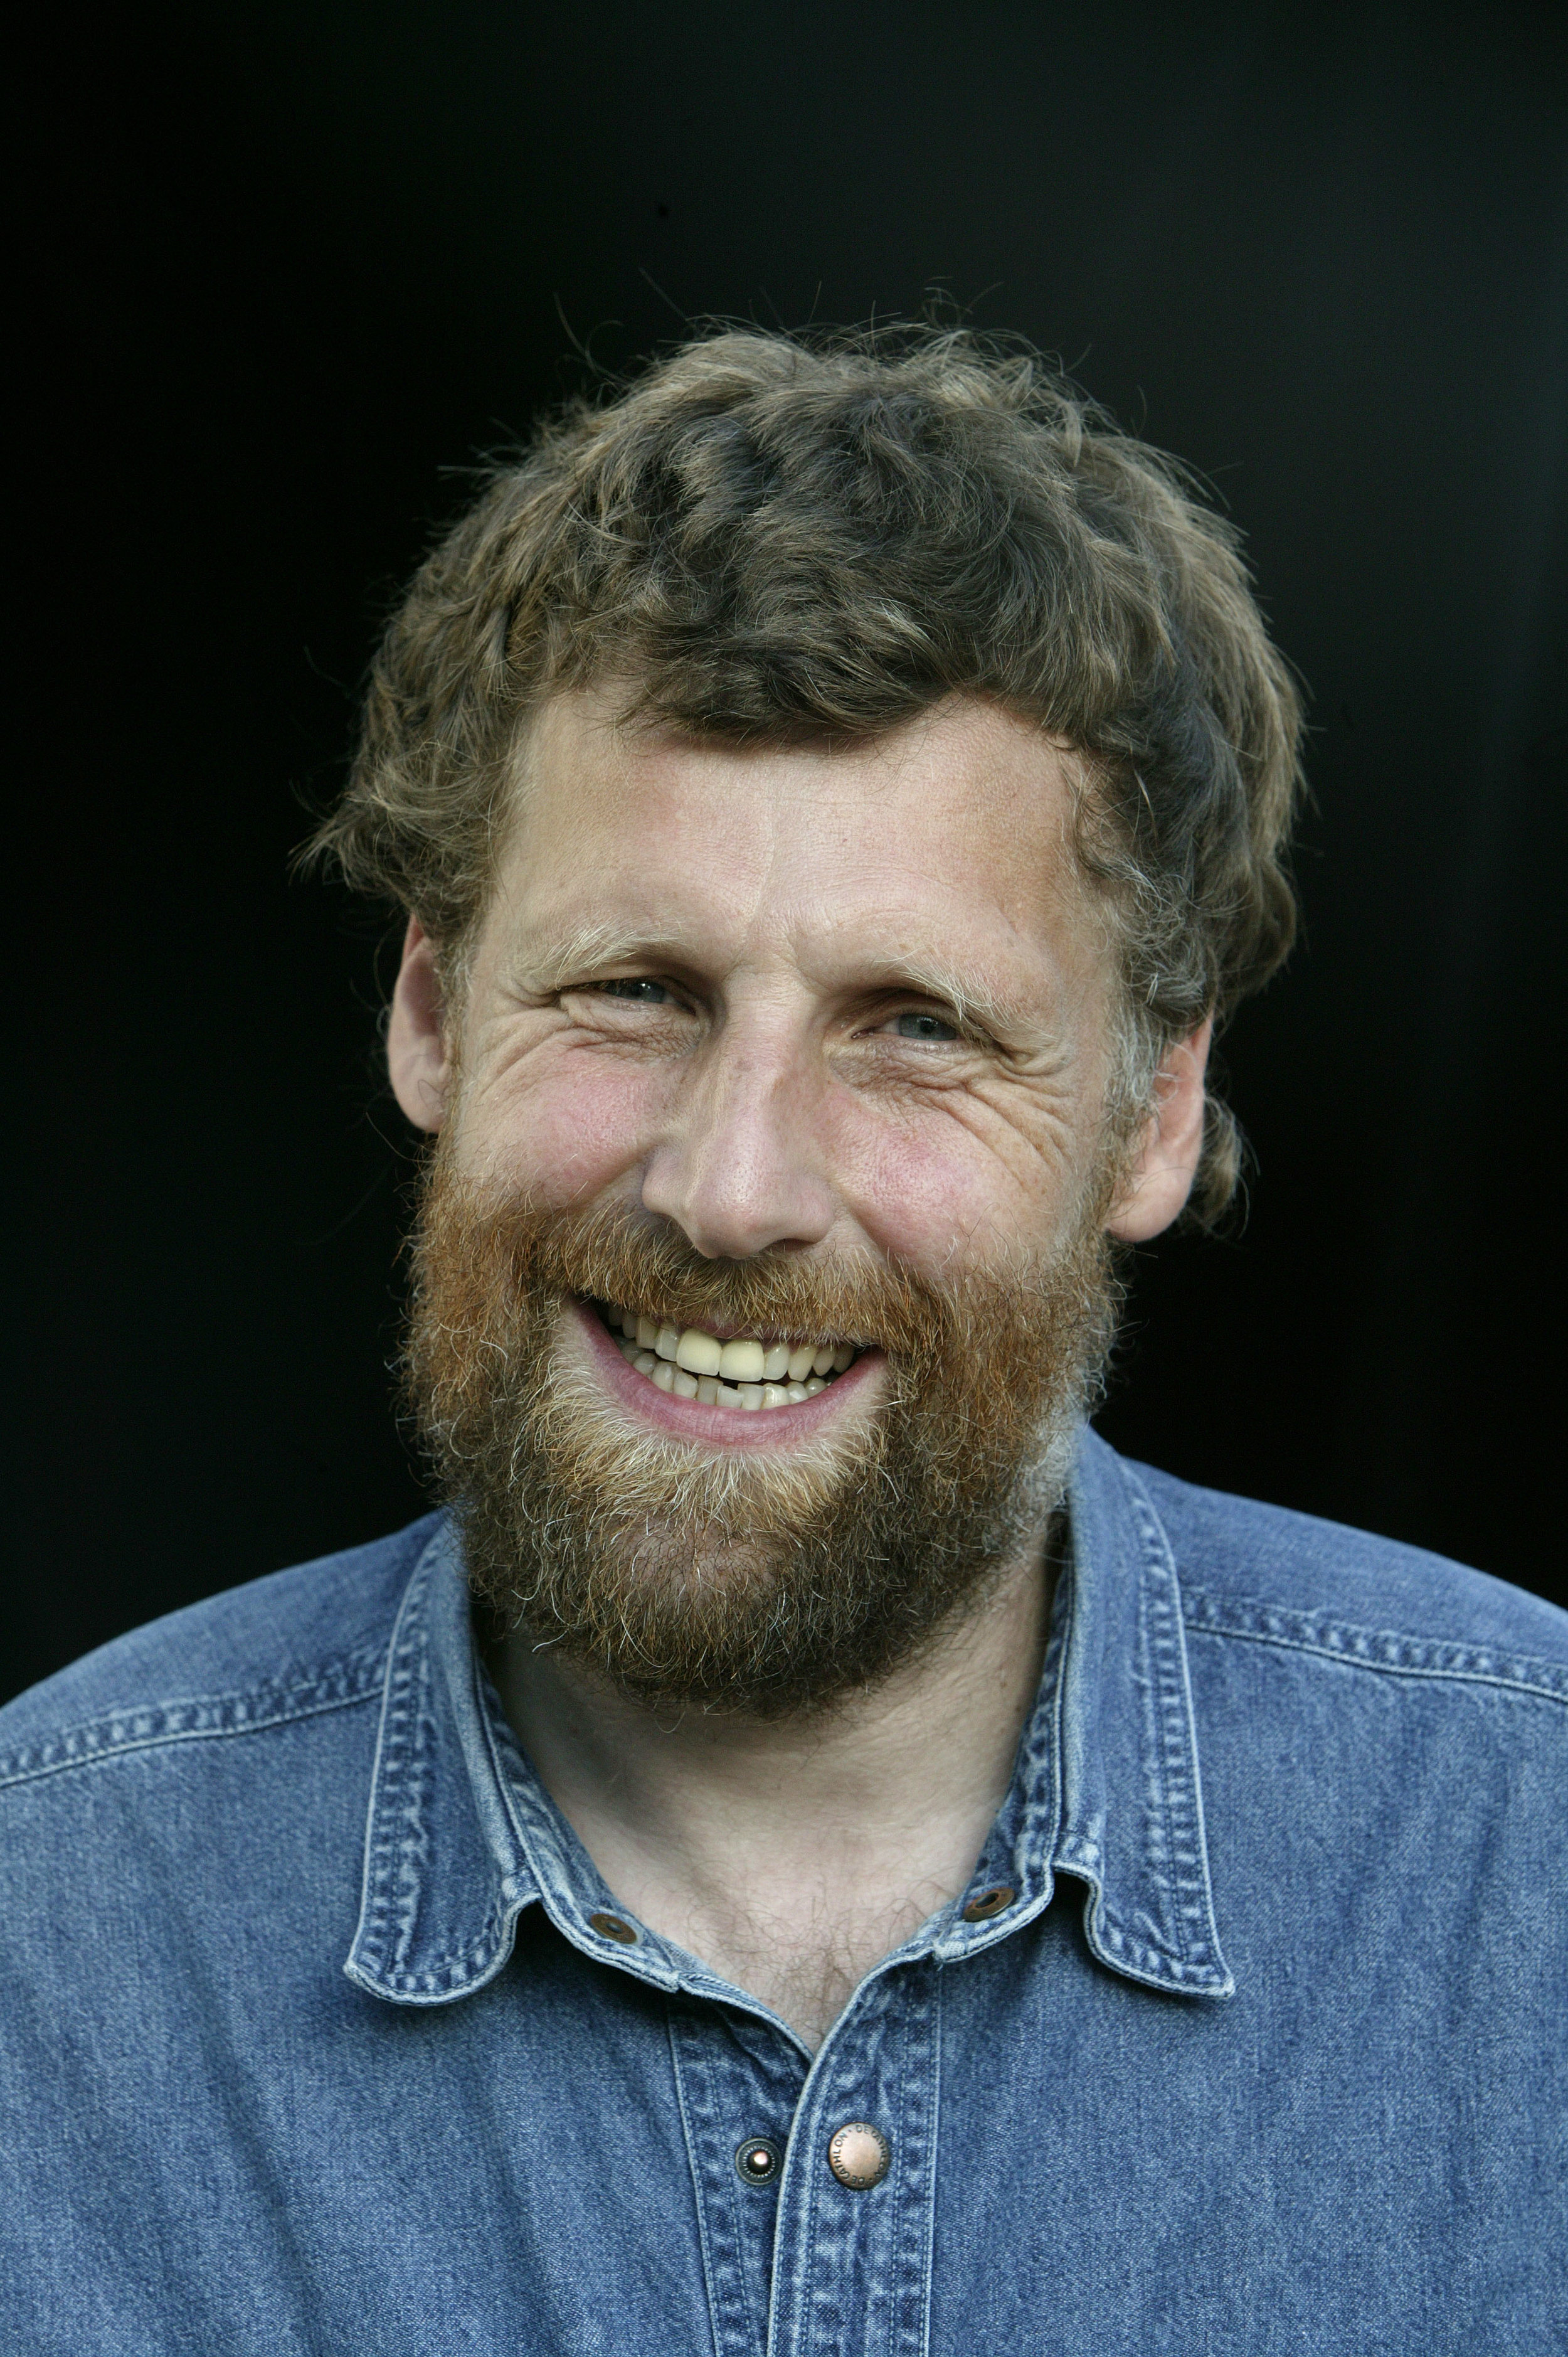 Alistair McIntosh